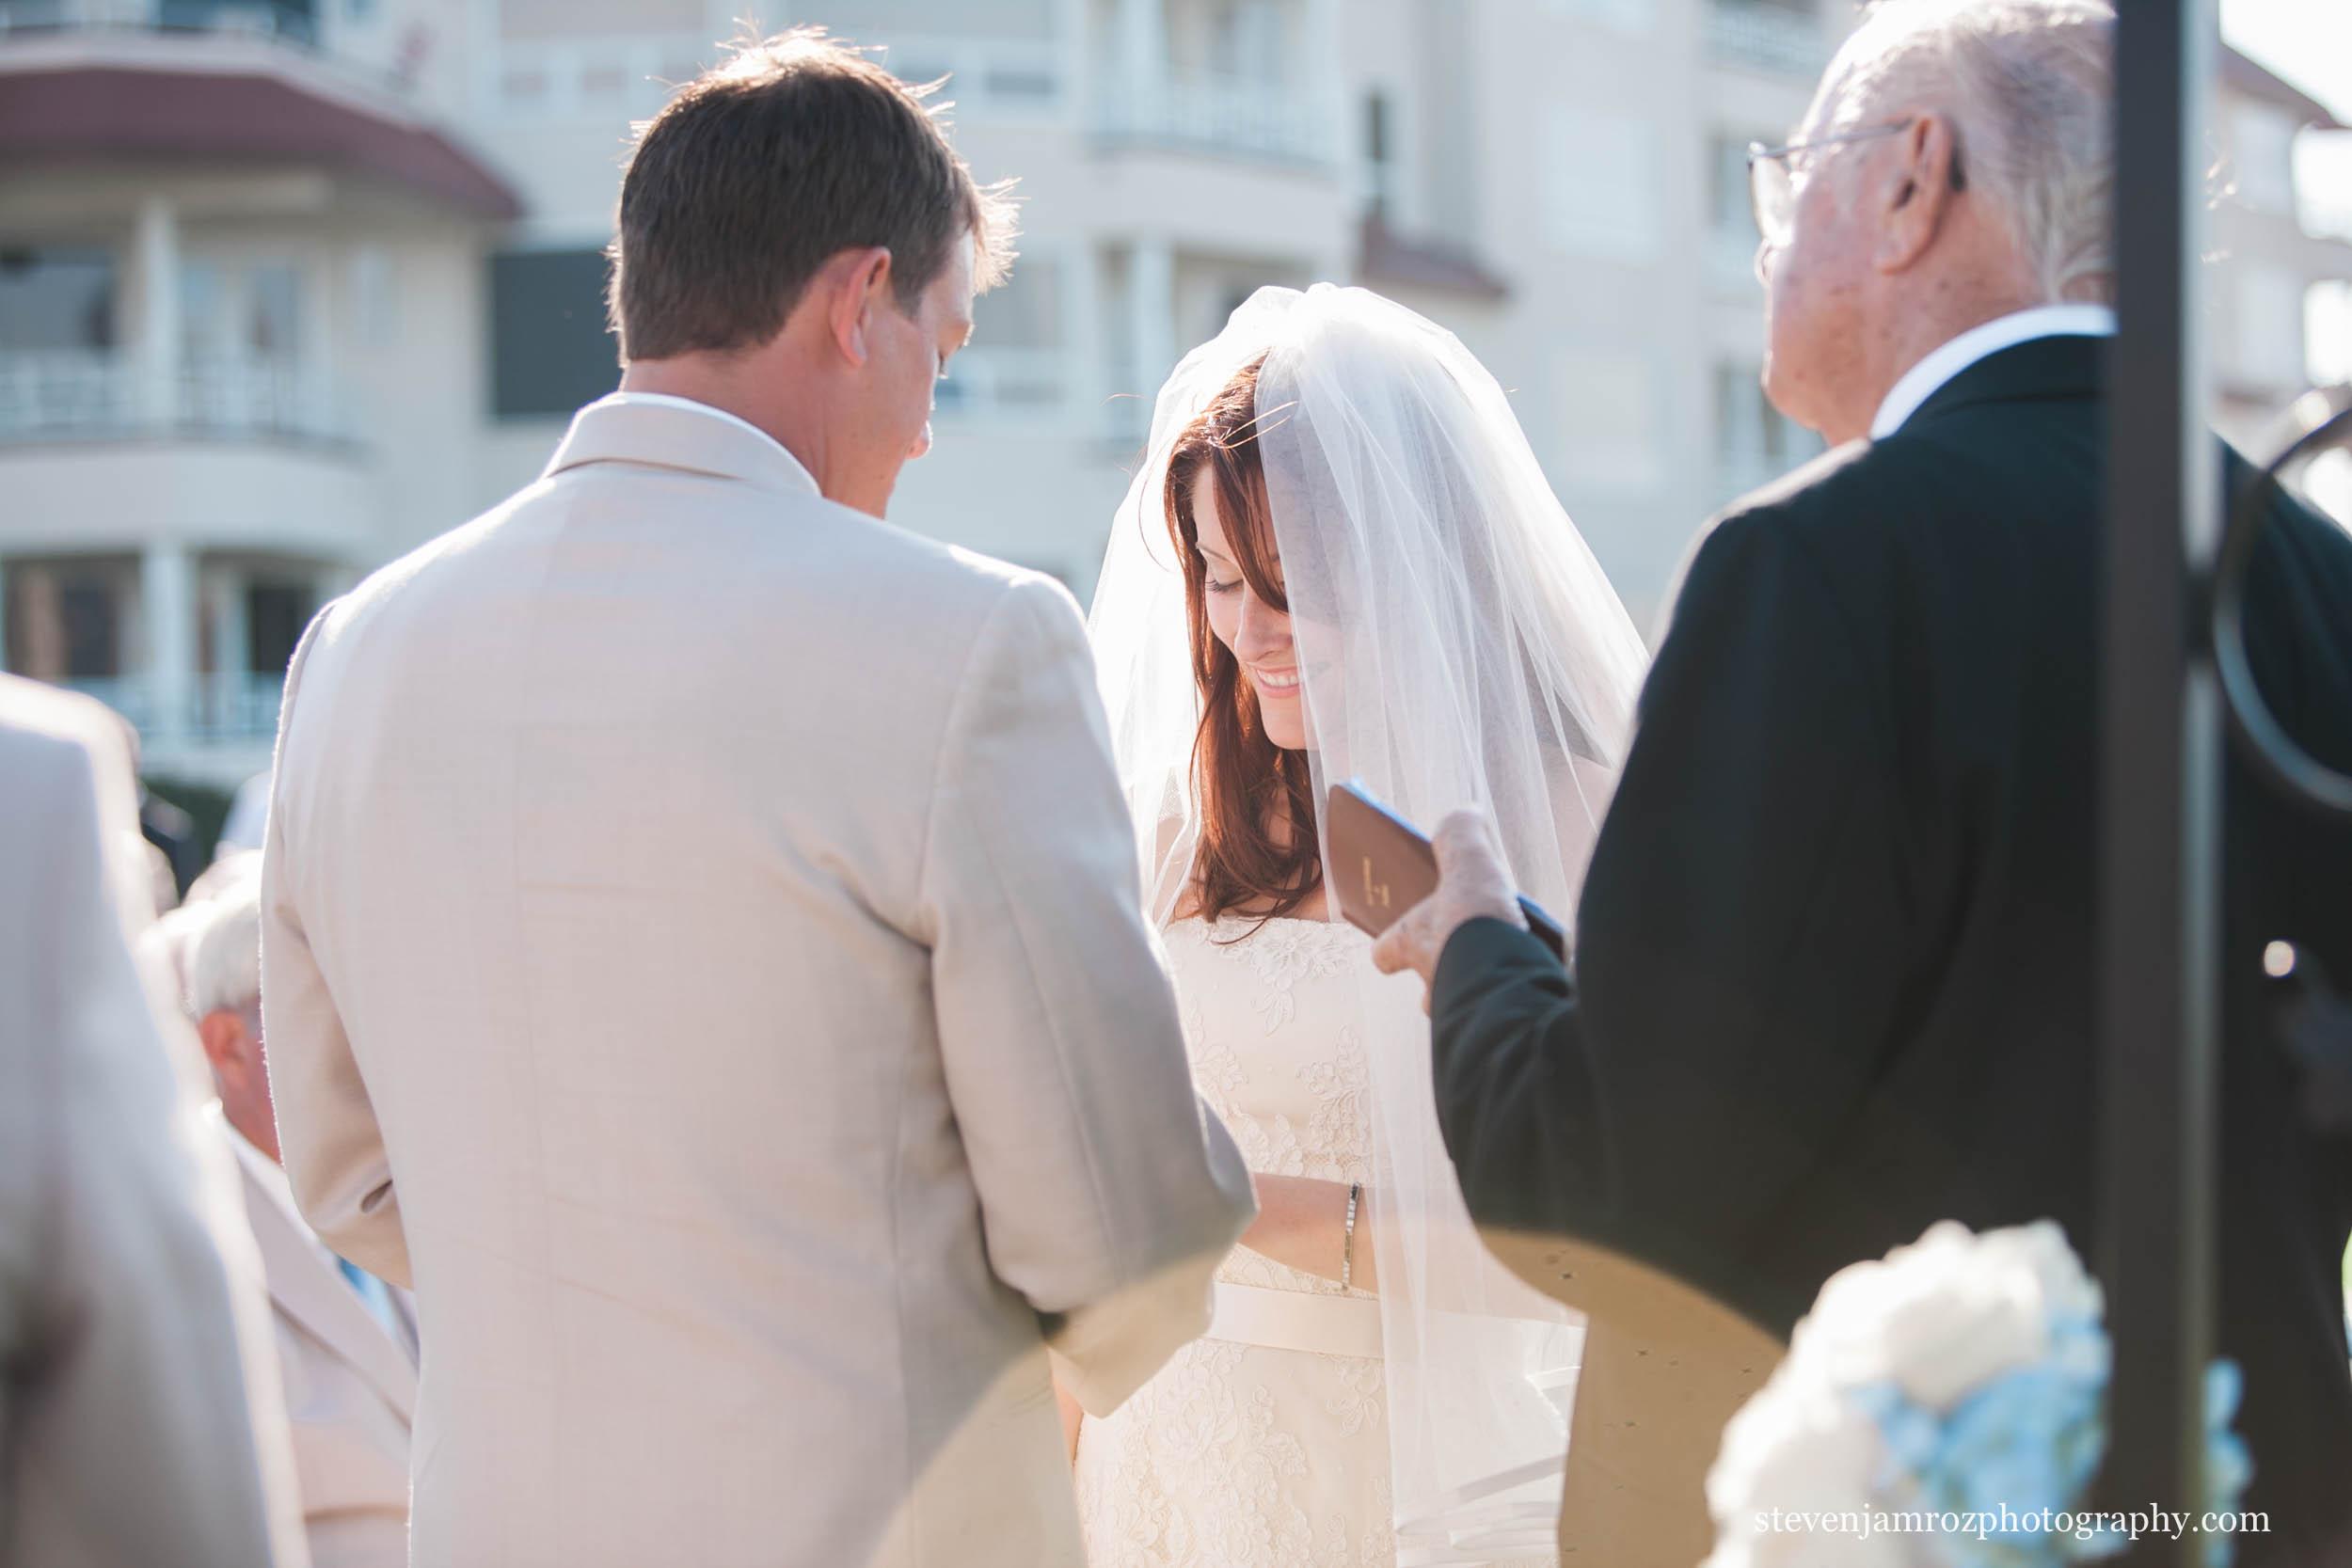 she-said-i-will-wedding-photography-0957.jpg